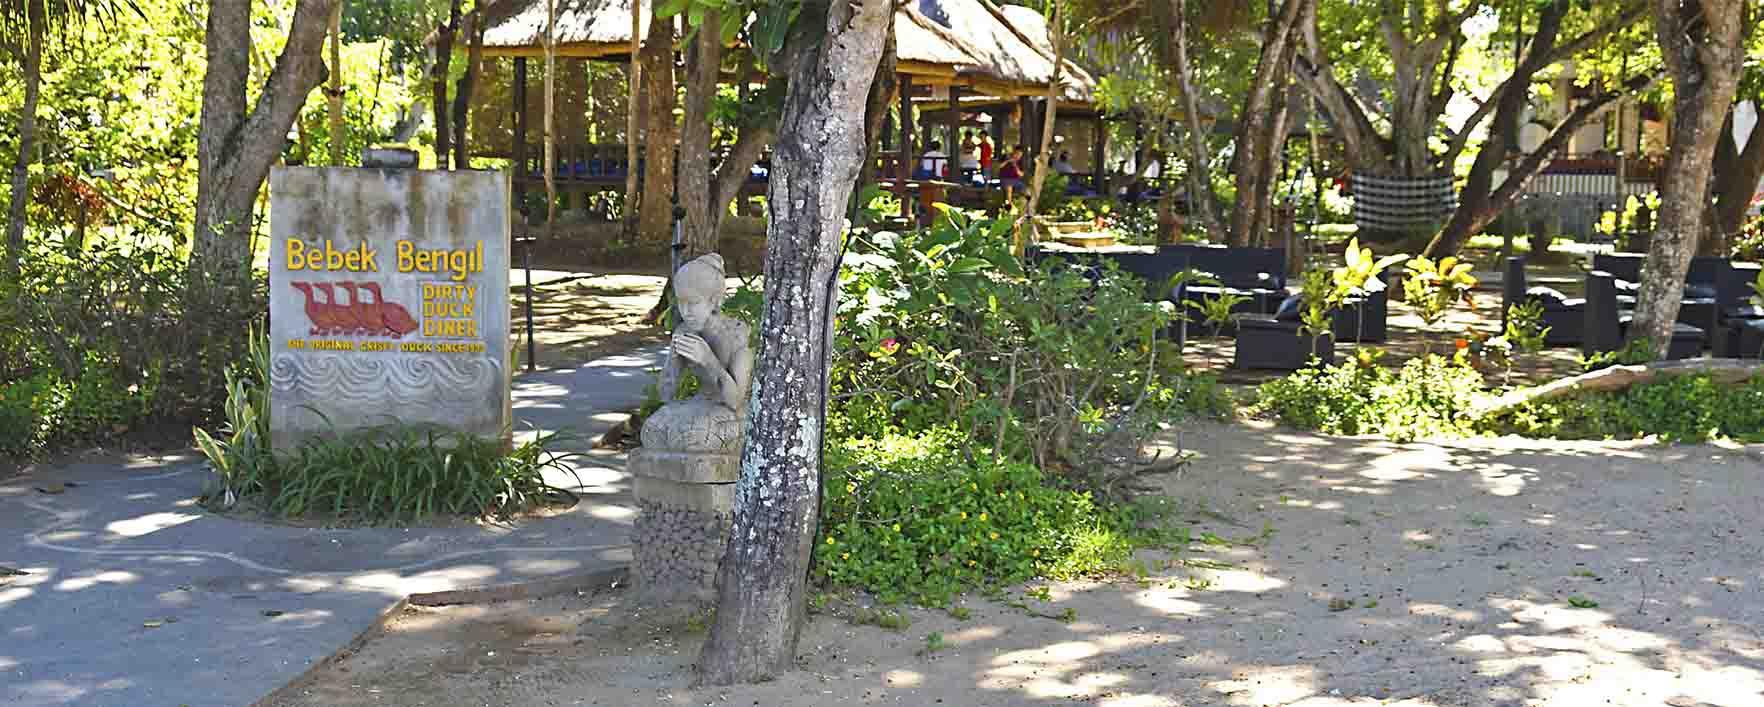 Bebek Bengil Restaurant Nusa Dua - Bali